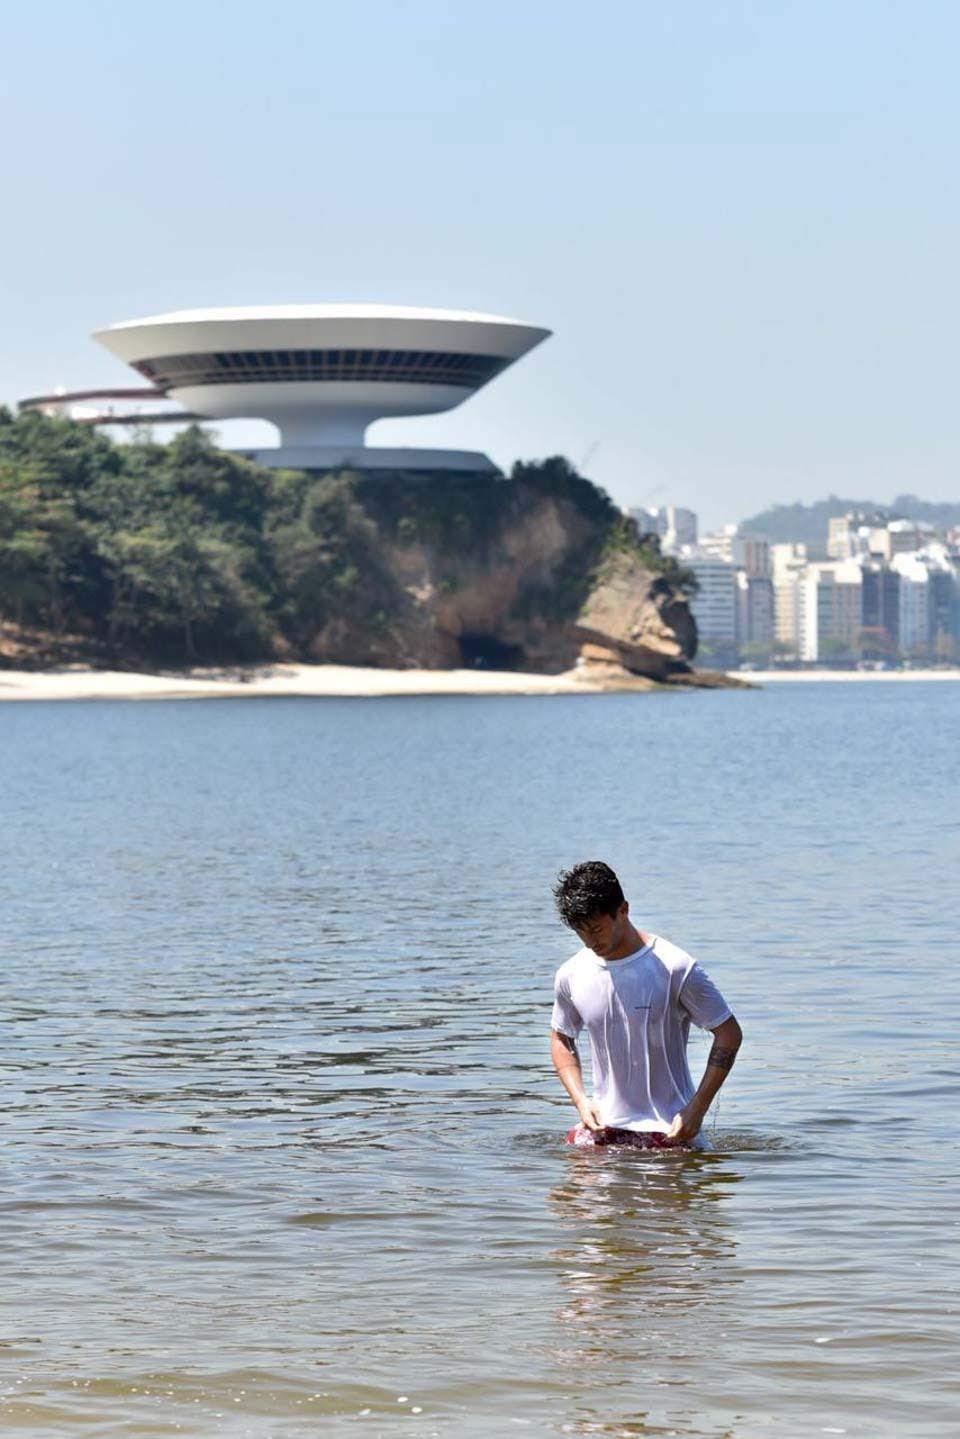 Brunno Natal posa para ensaio em praia de Niterói. Foto: Guto Ribas